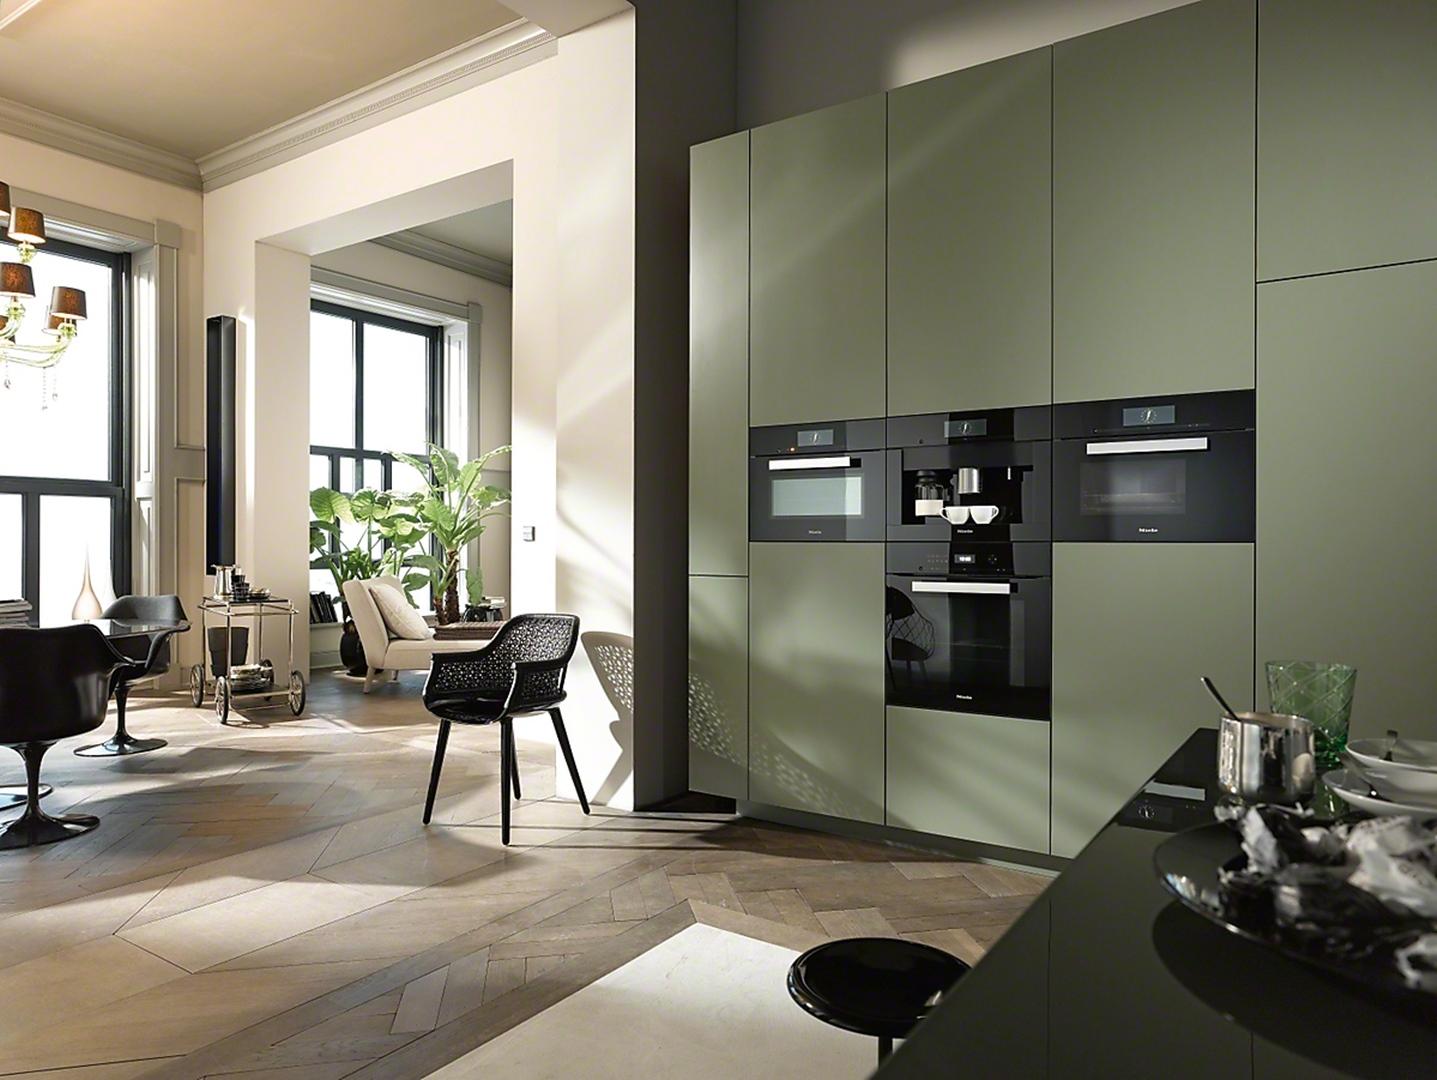 miele cva 6805 black obsidian cva 6805 obsw coffee machines built in. Black Bedroom Furniture Sets. Home Design Ideas